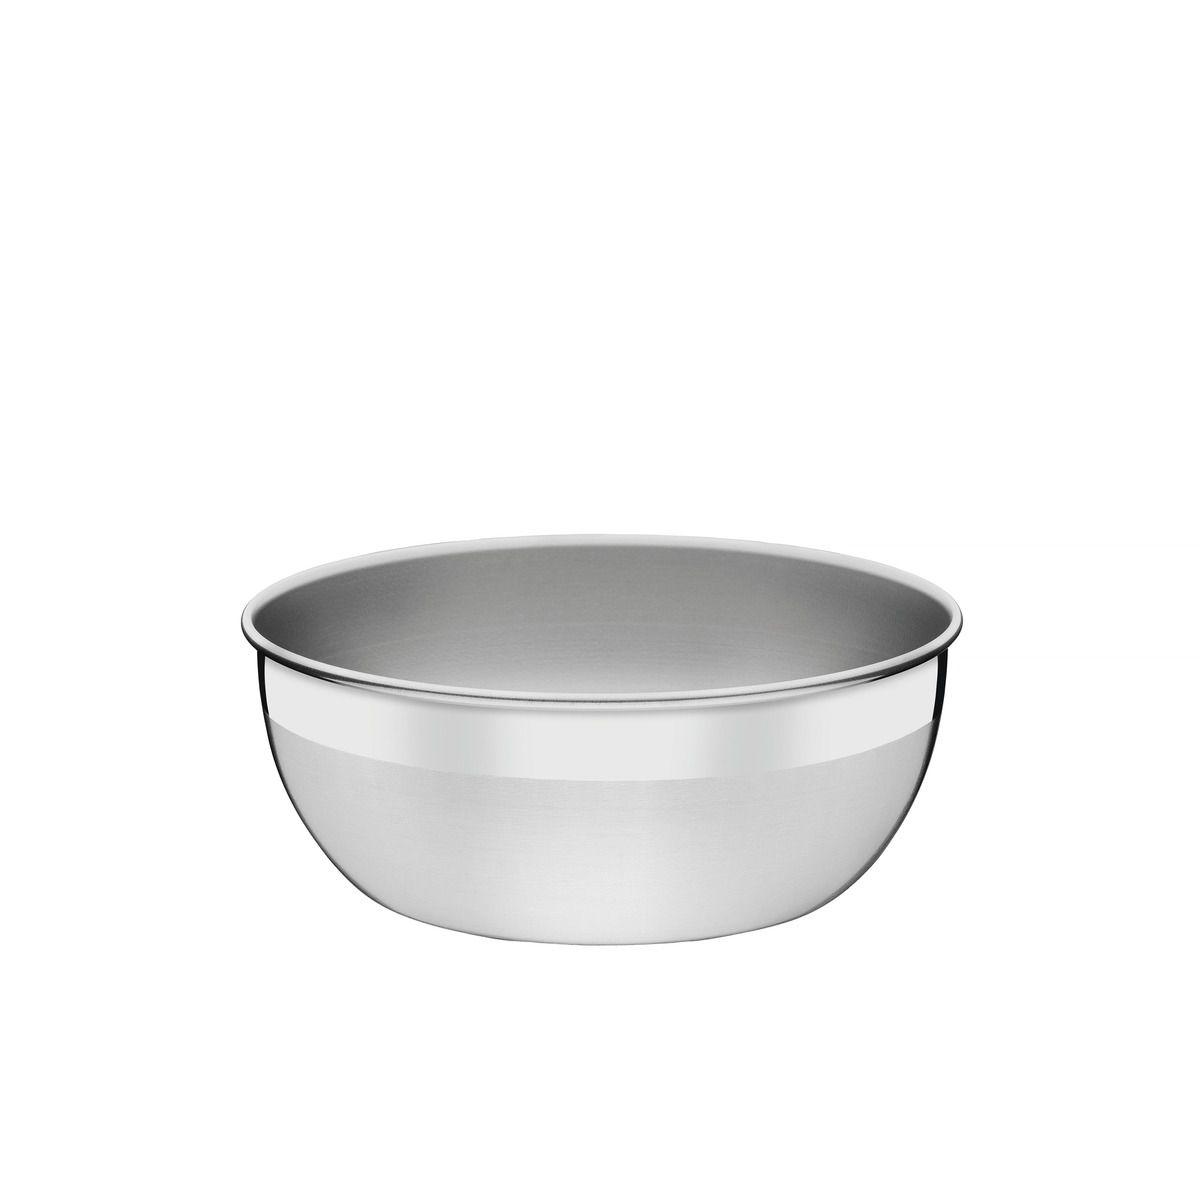 Pote redondo aço inox sem tampa plástica Ø 20cm 61220/201 | Lojas Estrela